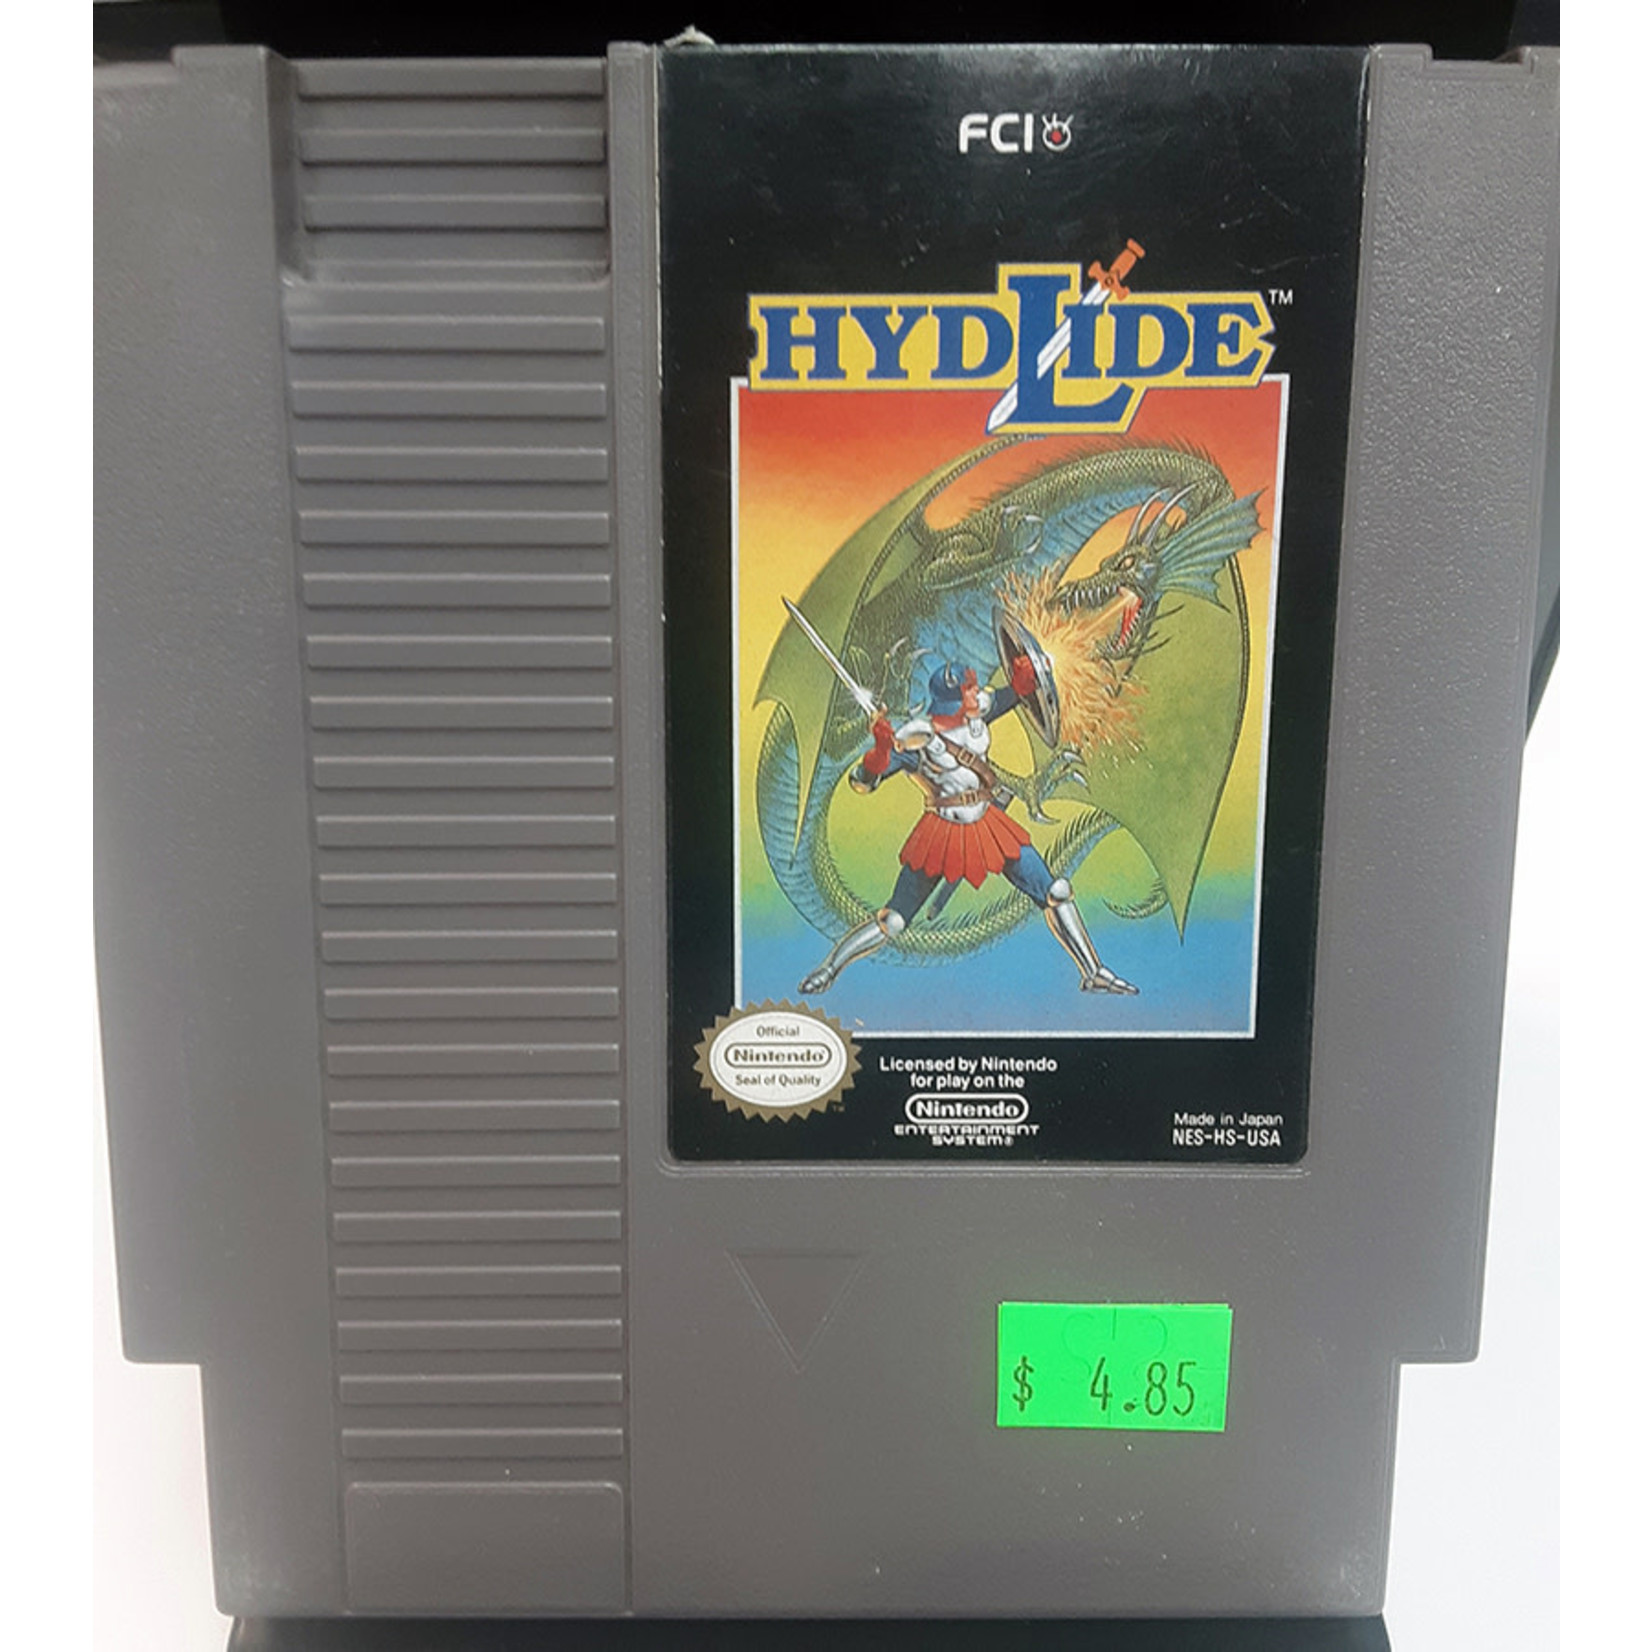 NESu-Hydlide (cartridge)